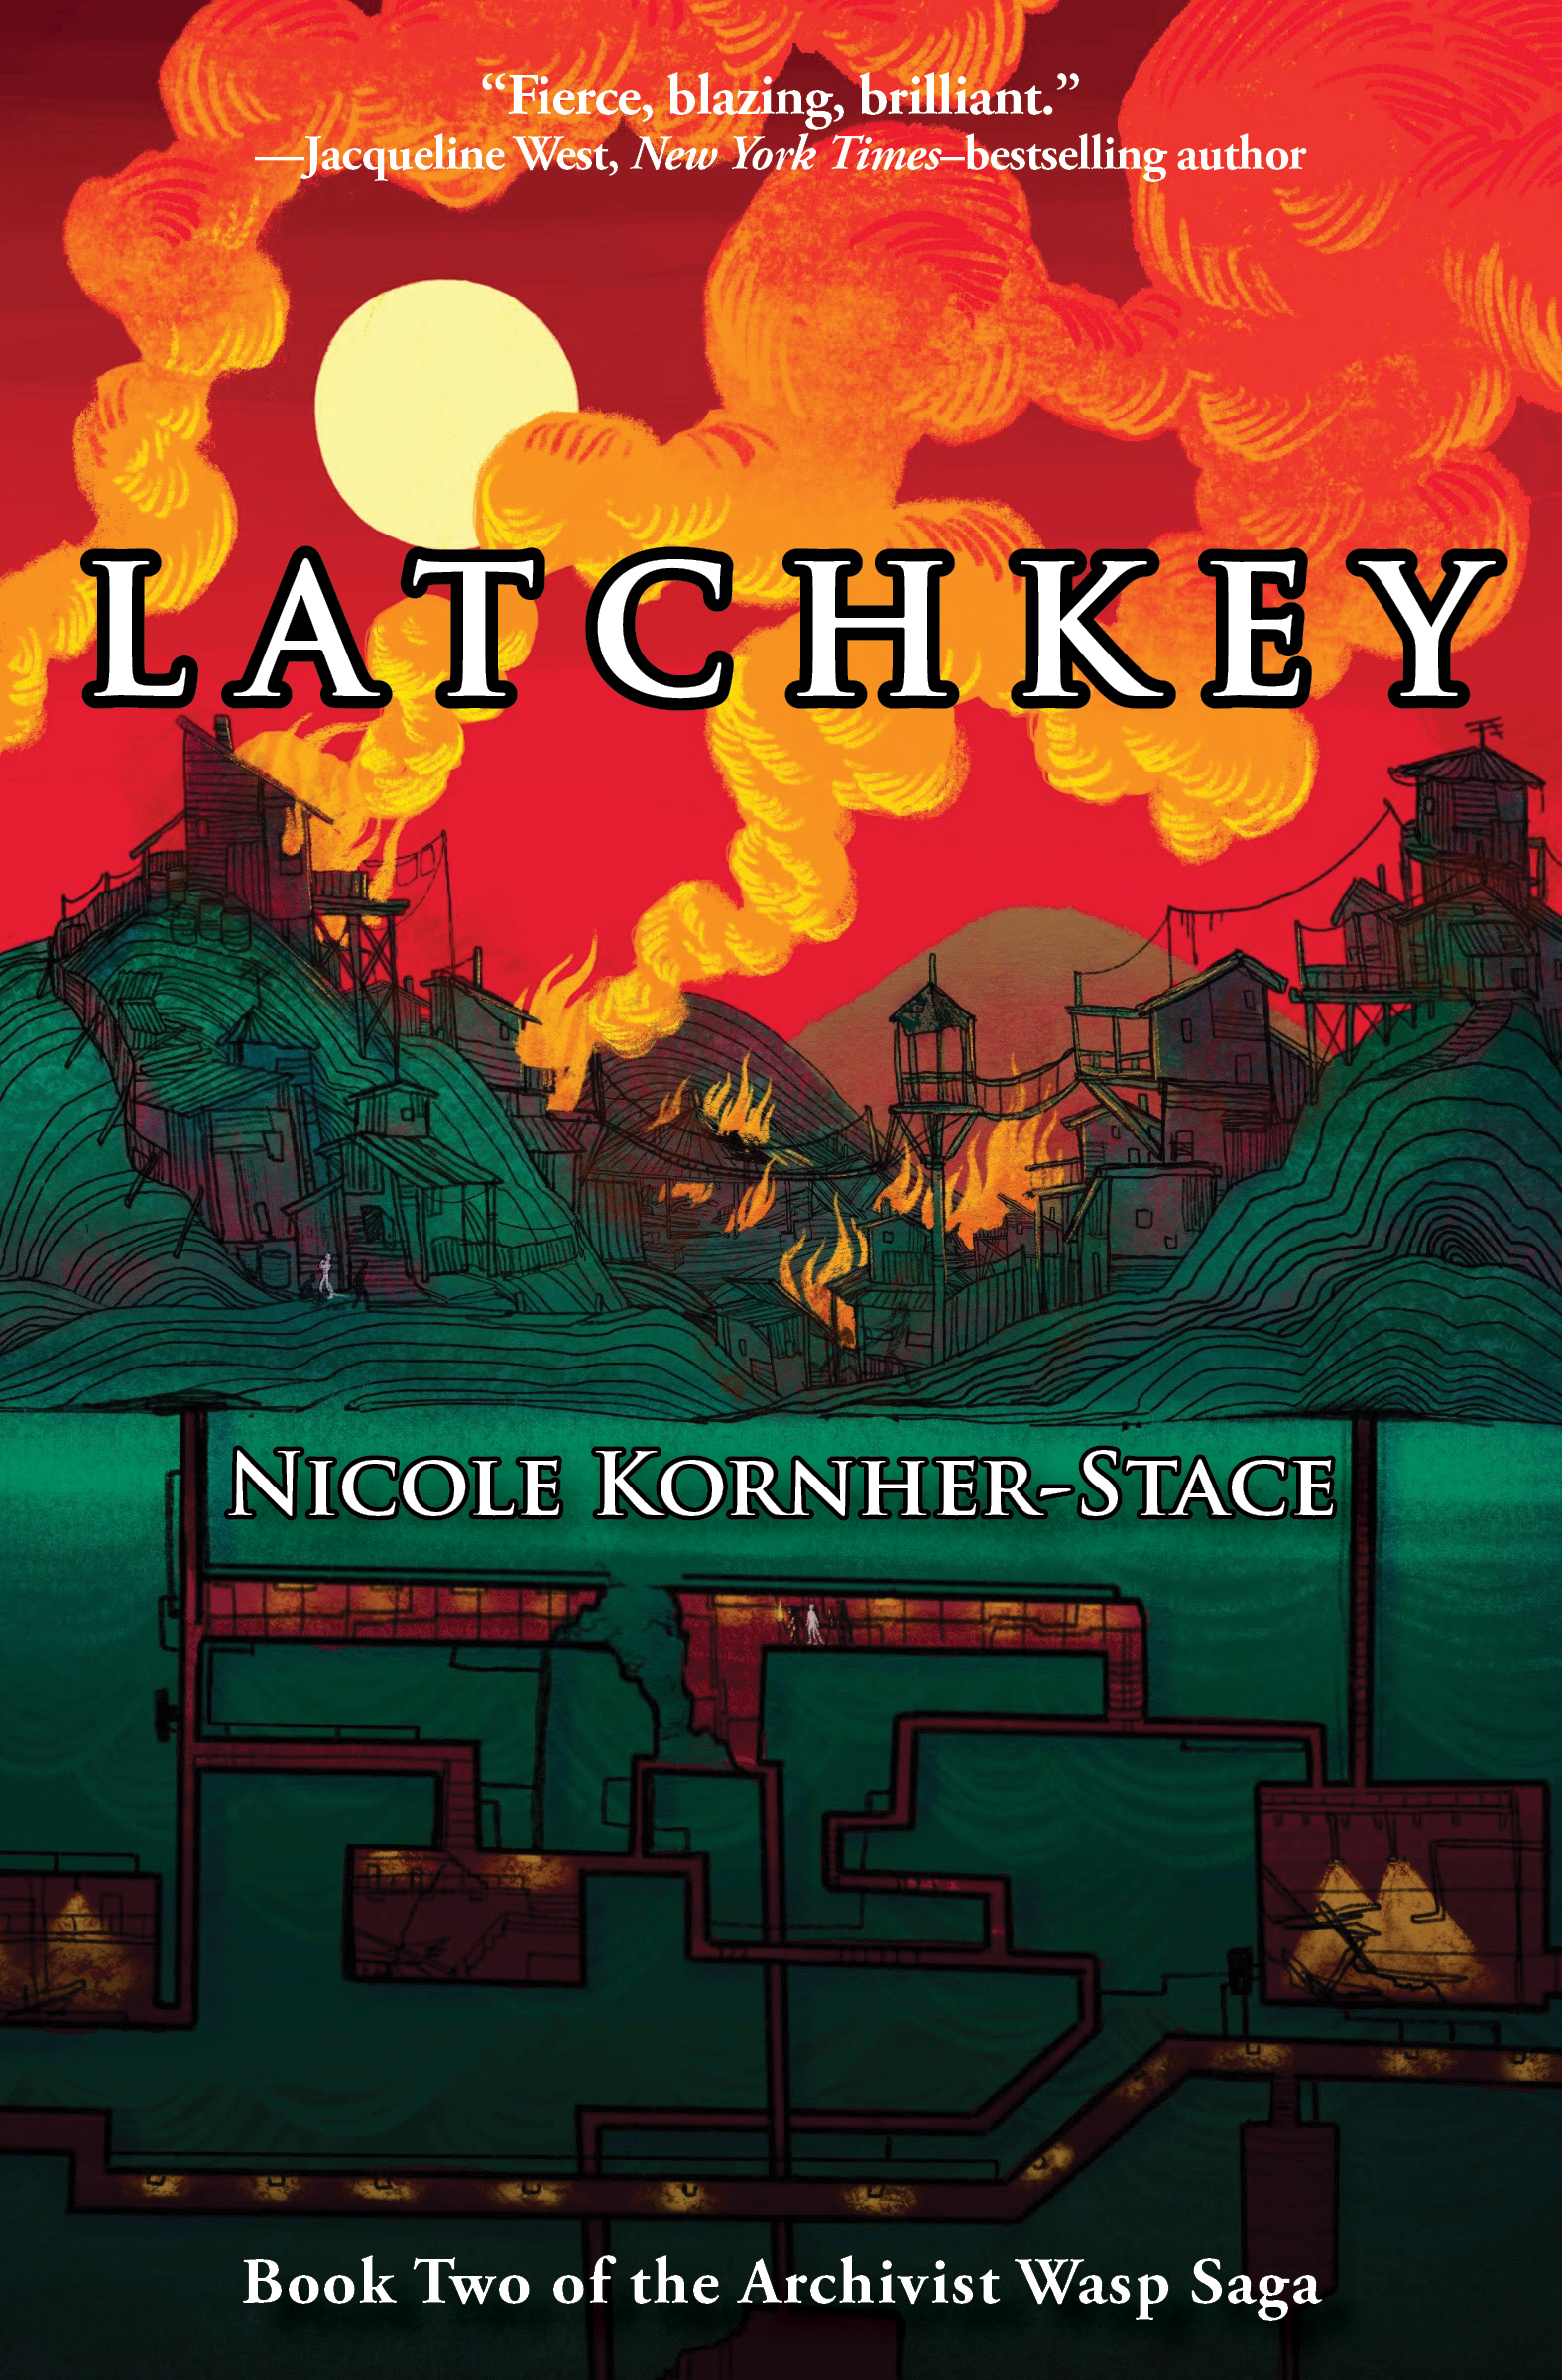 Latchkey (Archivist Wasp Saga, #2) by Nicole Kornher-Stace